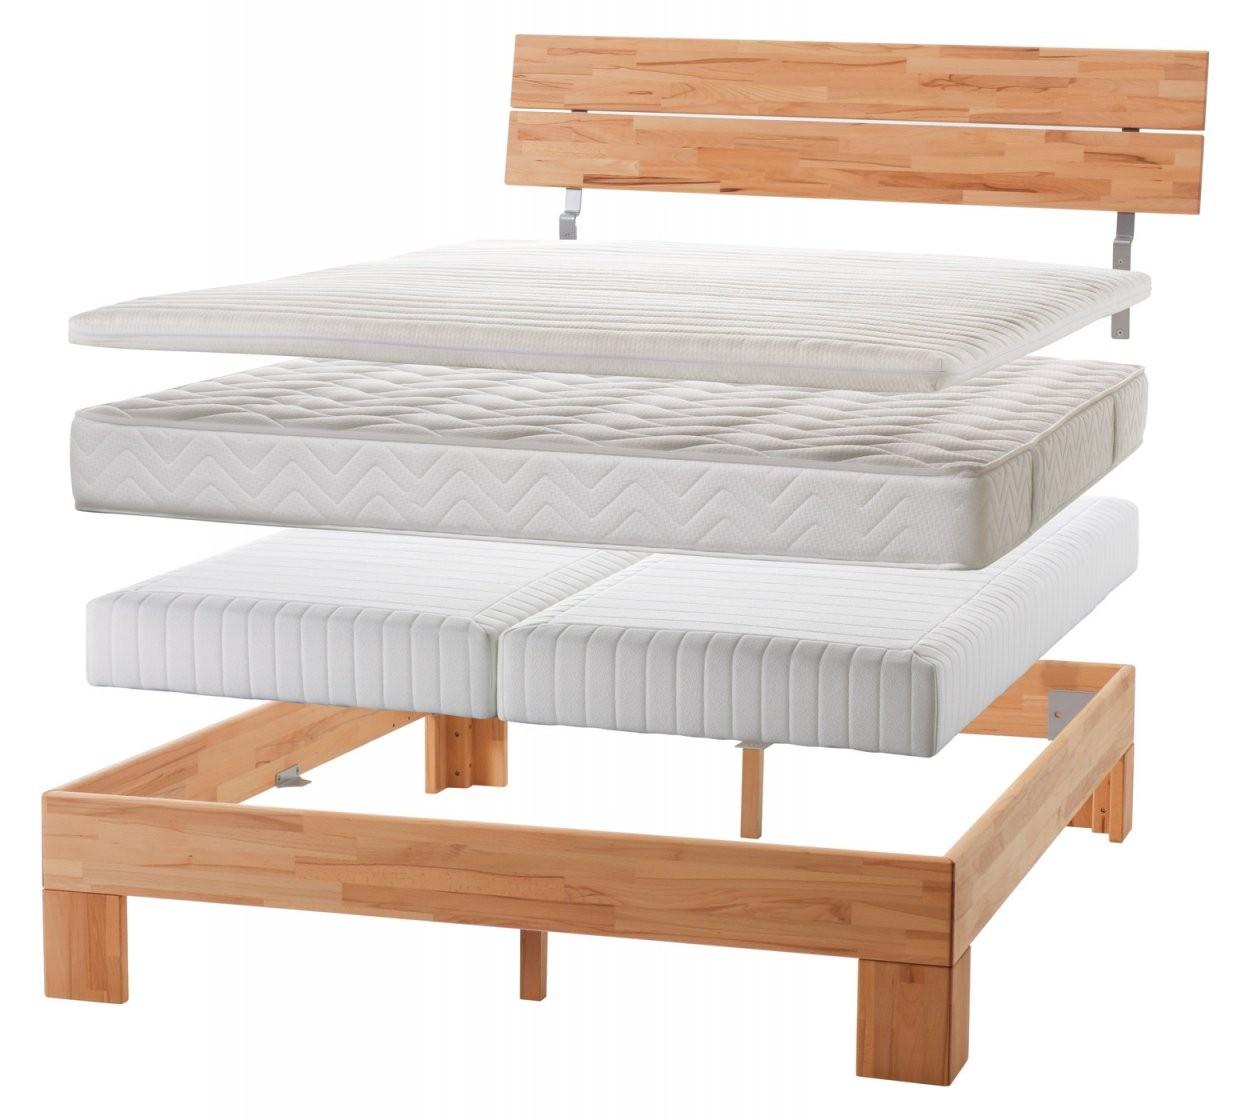 Normales Bett Zum Boxspringbett Umbauen  Einlegesystem Kingston von Normales Bett Zum Boxspringbett Umbauen Bild